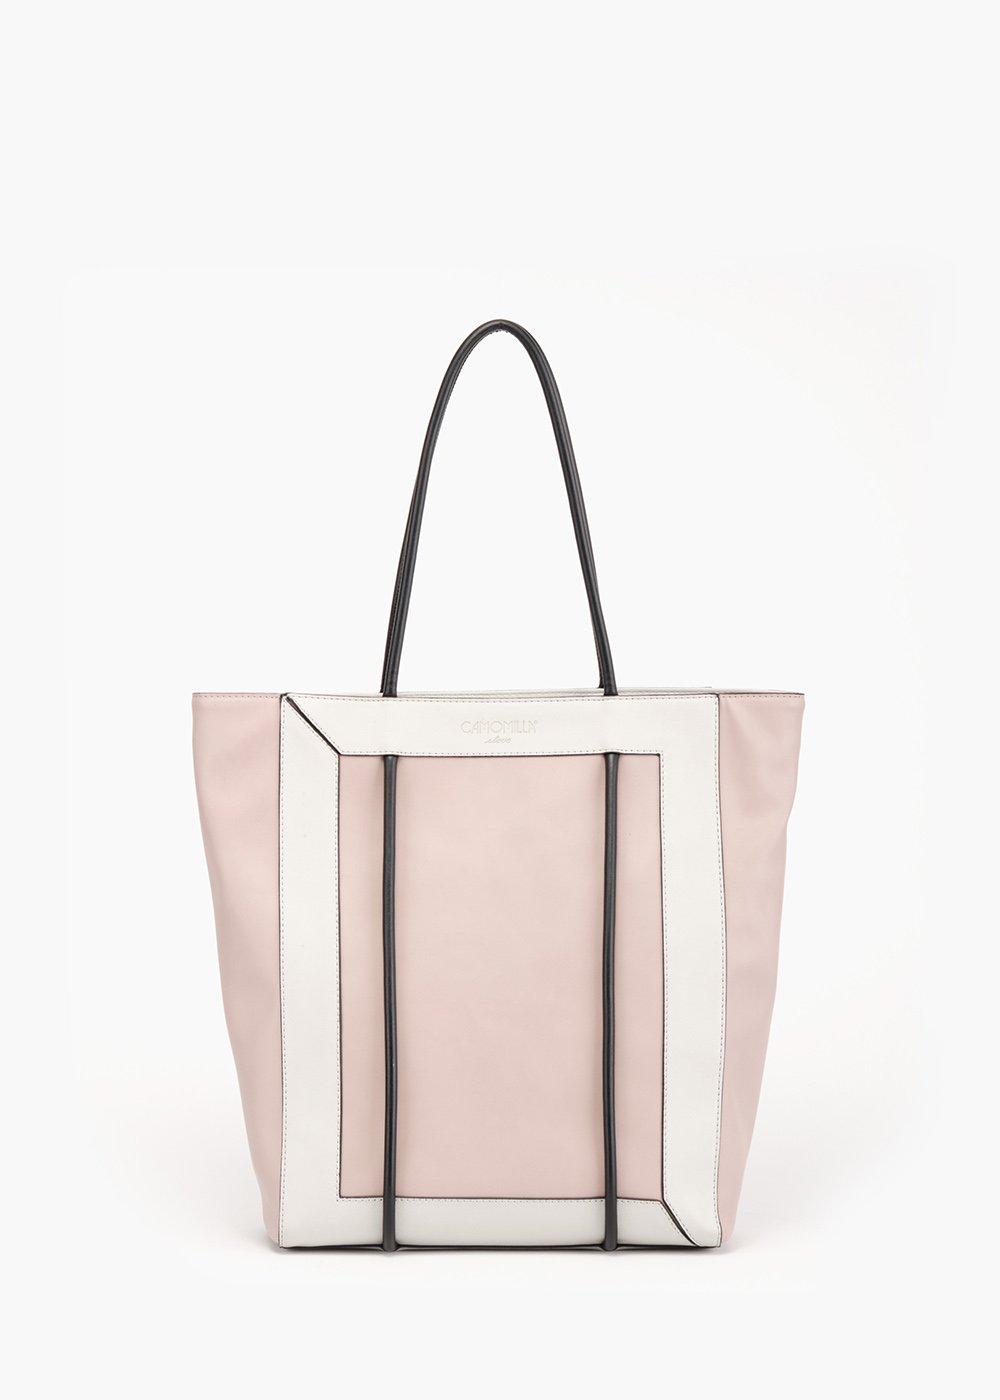 Bedey shopping bag with tubular handle - Polvere / Grezzo - Woman